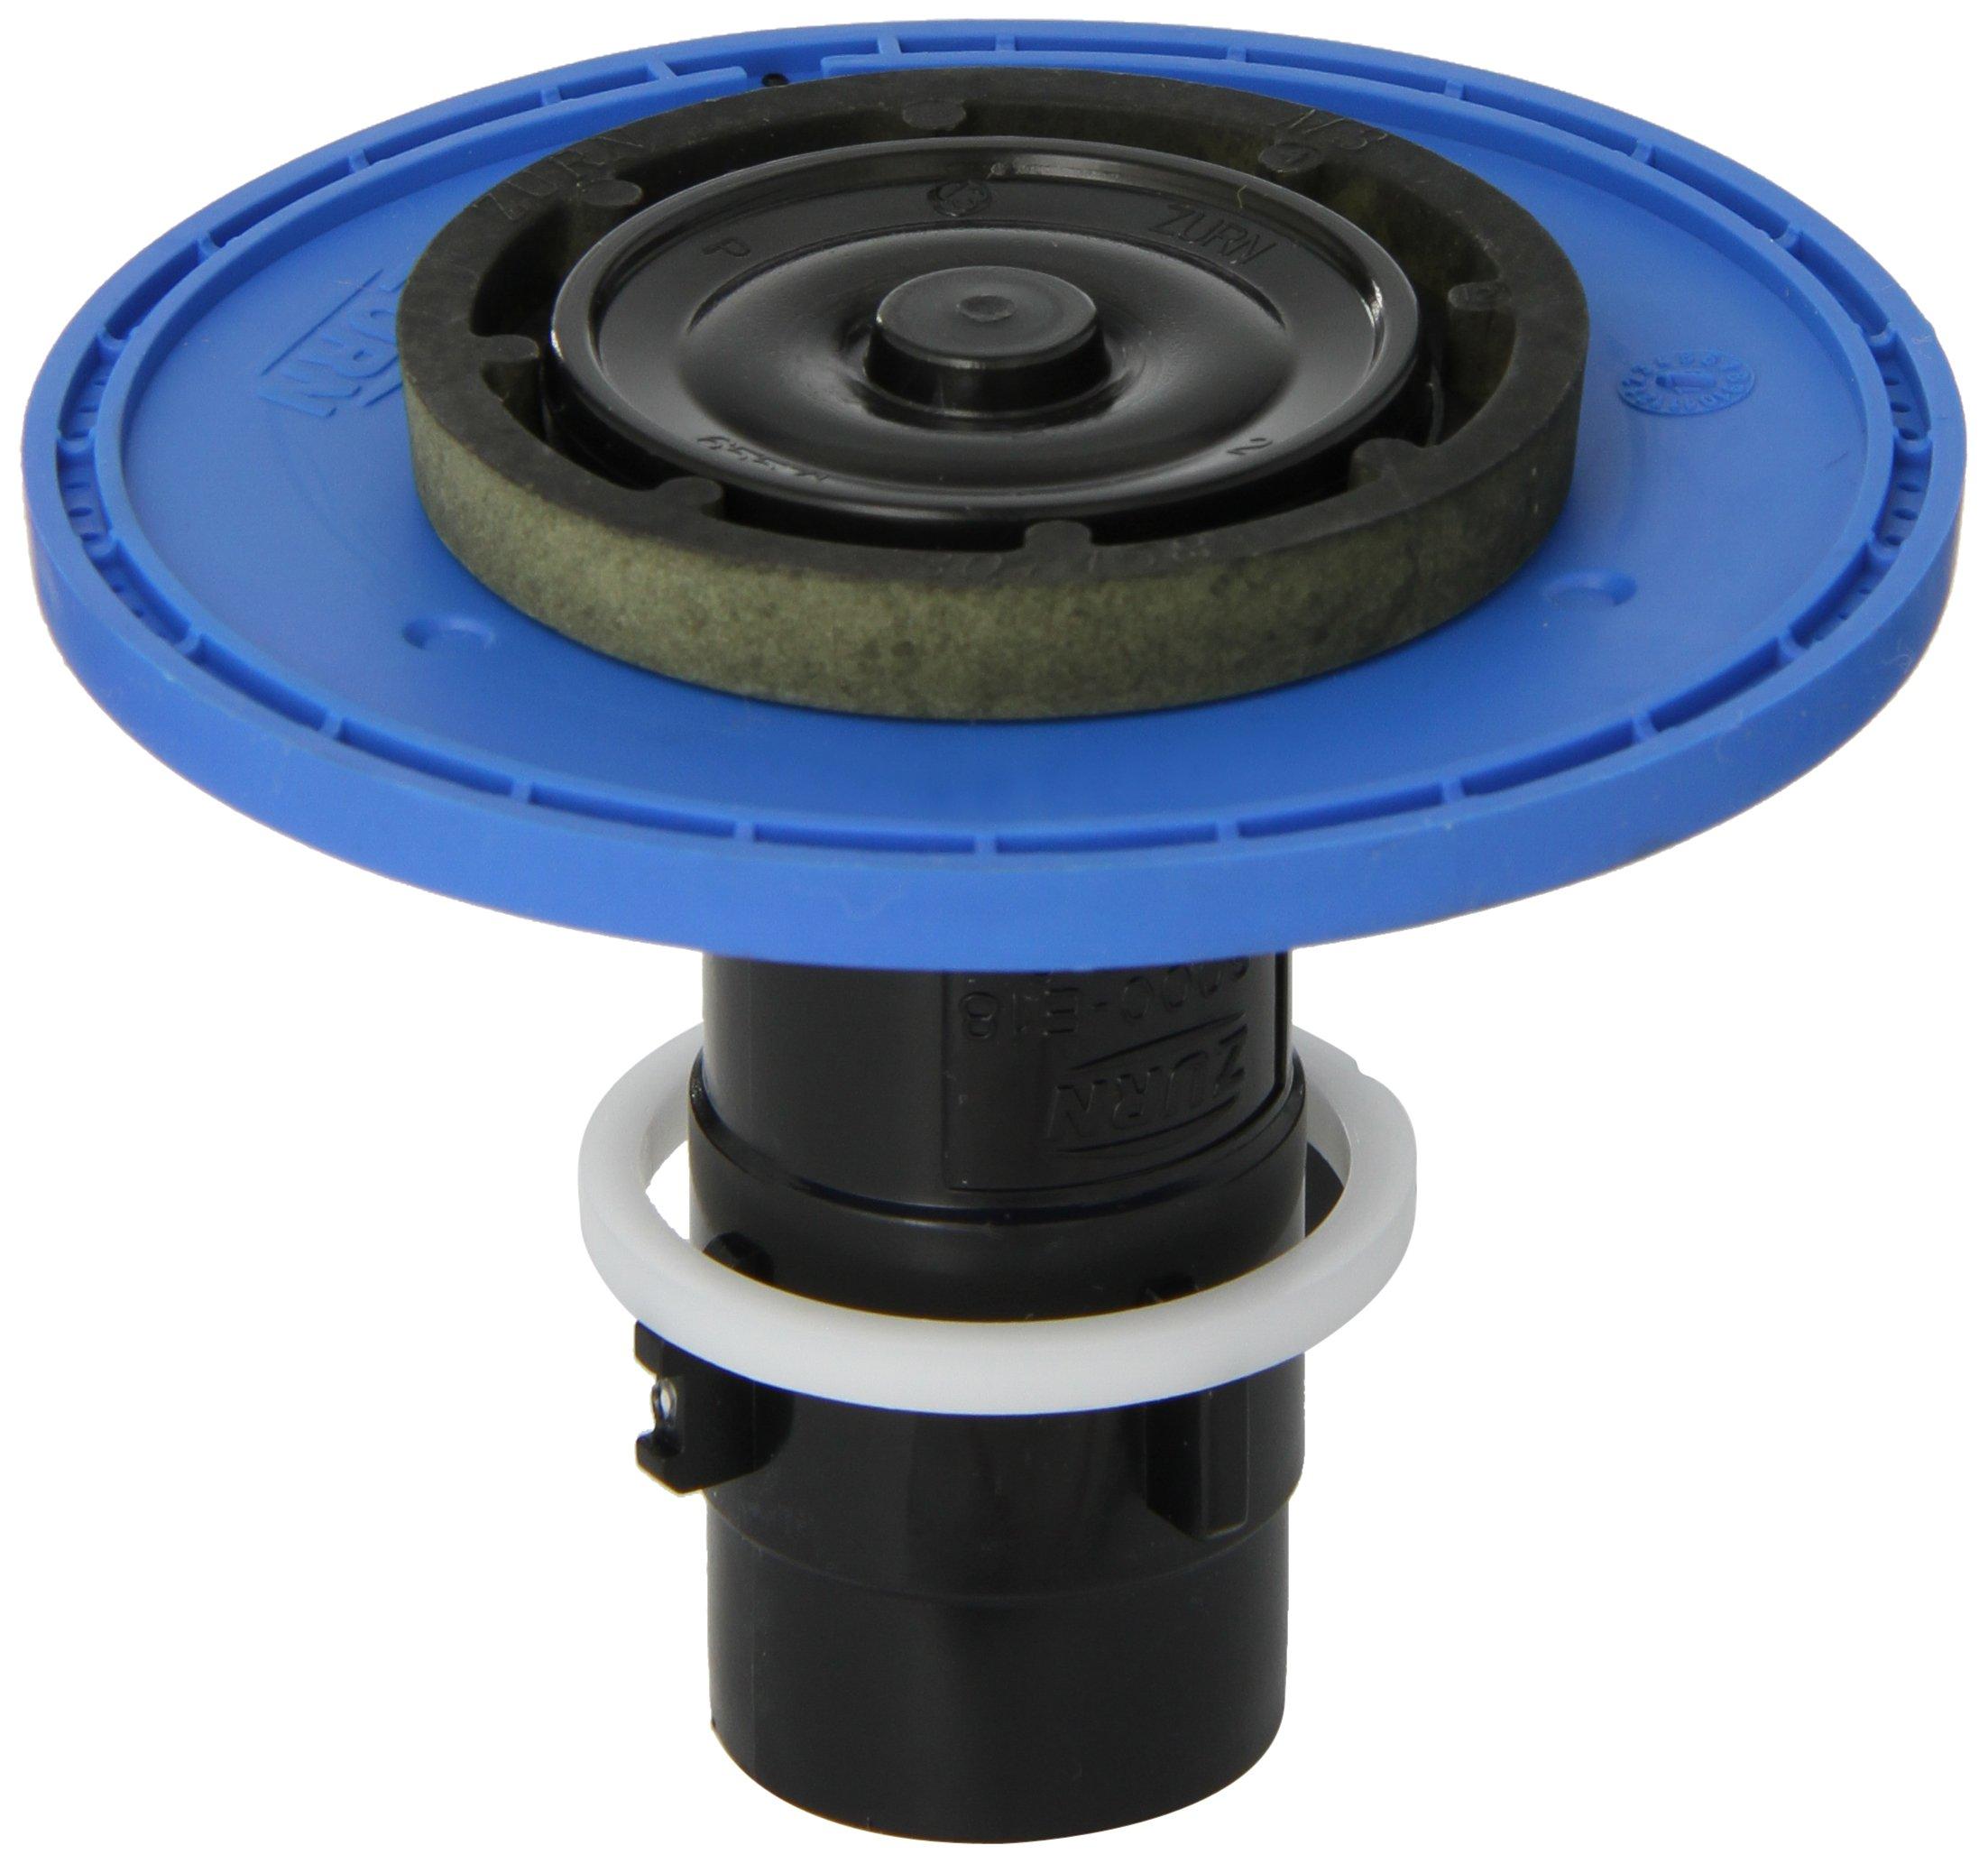 Zurn AquaVantage Urinal Repair Kit, P6000-EUA-WS1-CS, 1 gpf, Crosses to Sloan A-1042-A, Diaphragm Repair Kit in Clamshell by Zurn